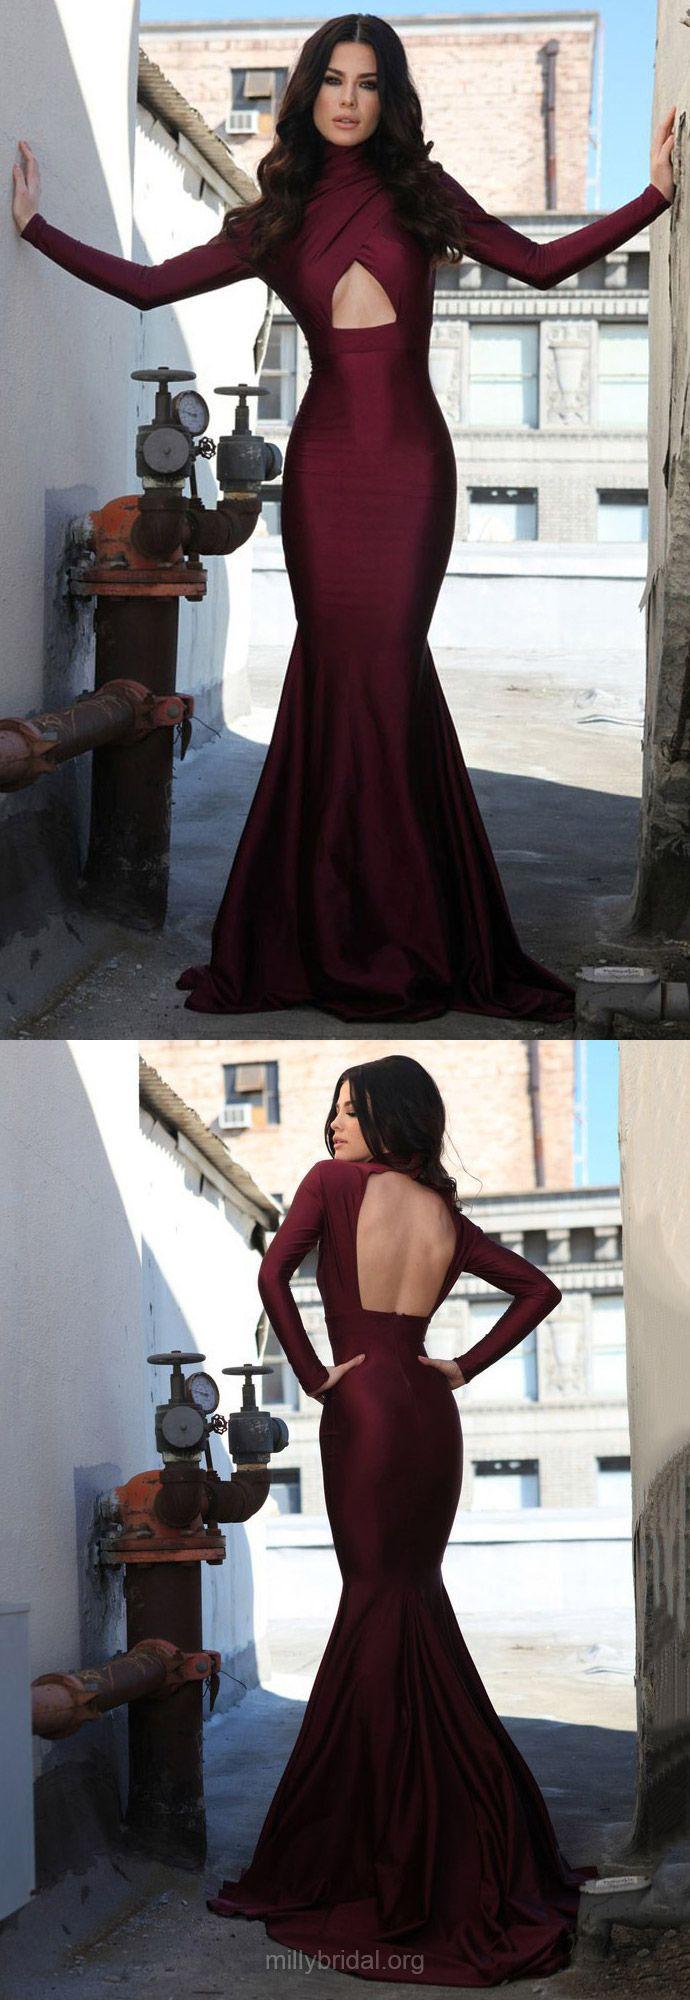 Burgundy Prom Dresses Long, 2018 Prom Dresses For Teens, Trumpet/Mermaid Formal Evening Dresses High Neck, Long Sleeve Pageant Dresses Open Back, Silk-like Satin Party Dresses Ruffles Modest